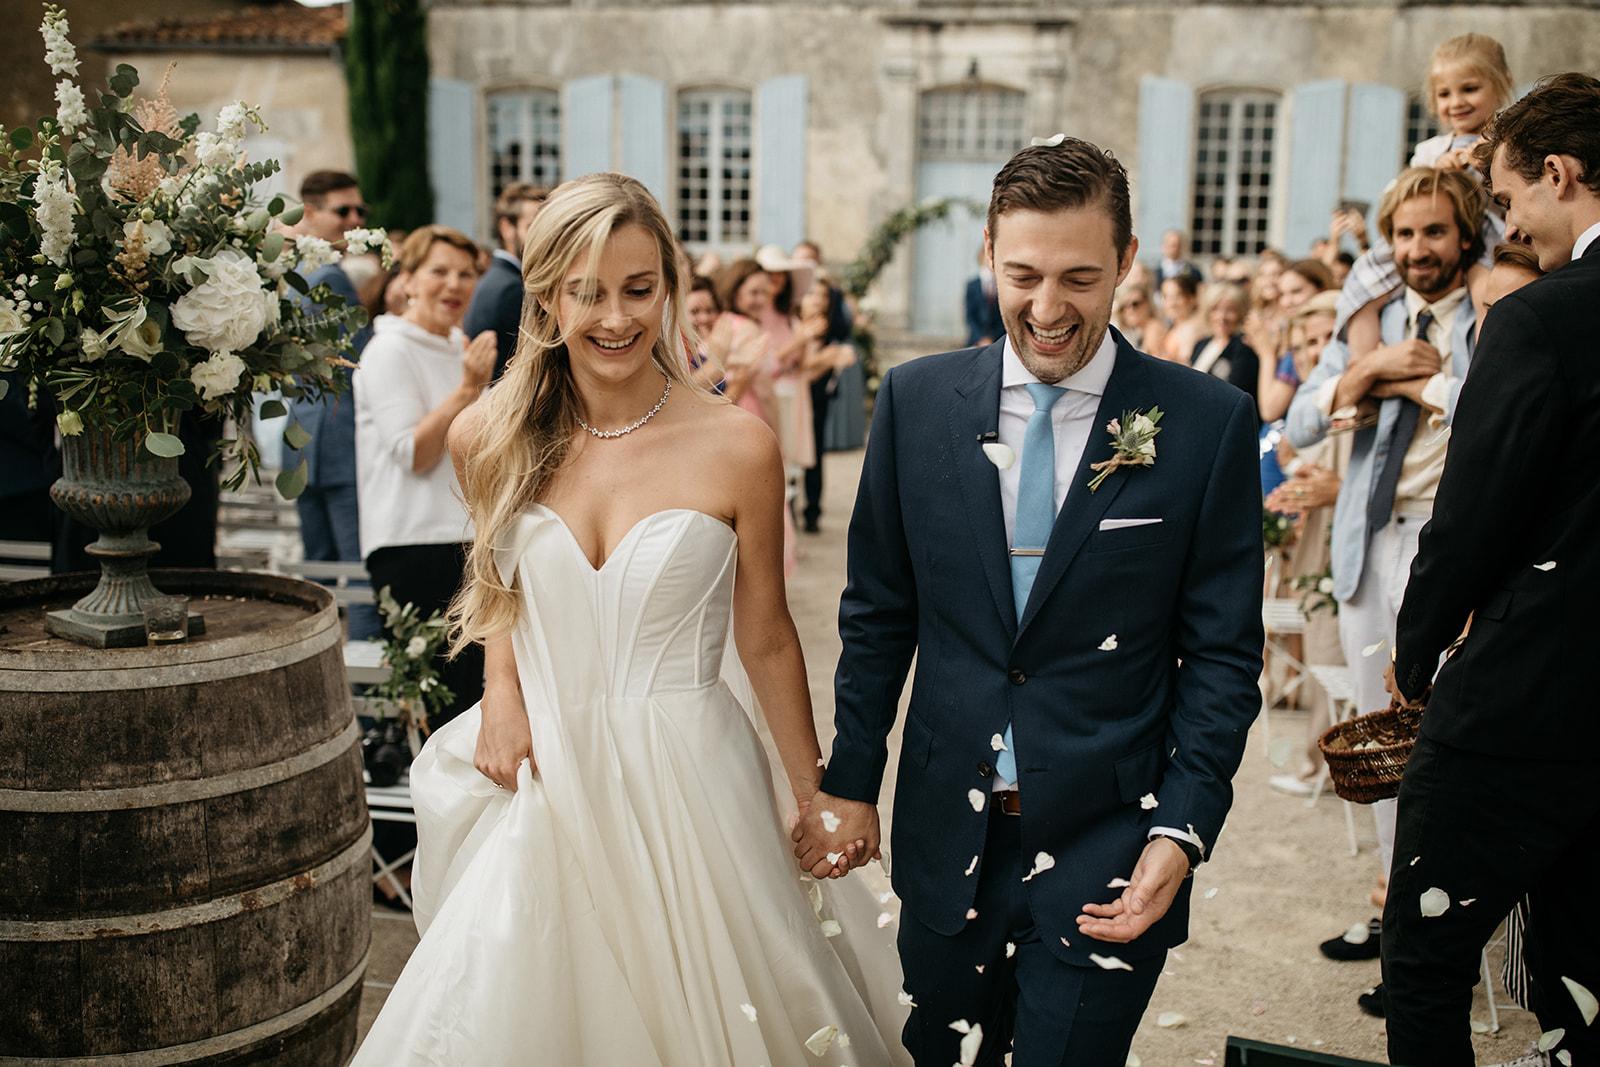 292-Madison-Joren-Wedding-Jarnac-2018-IMG_5715.jpg